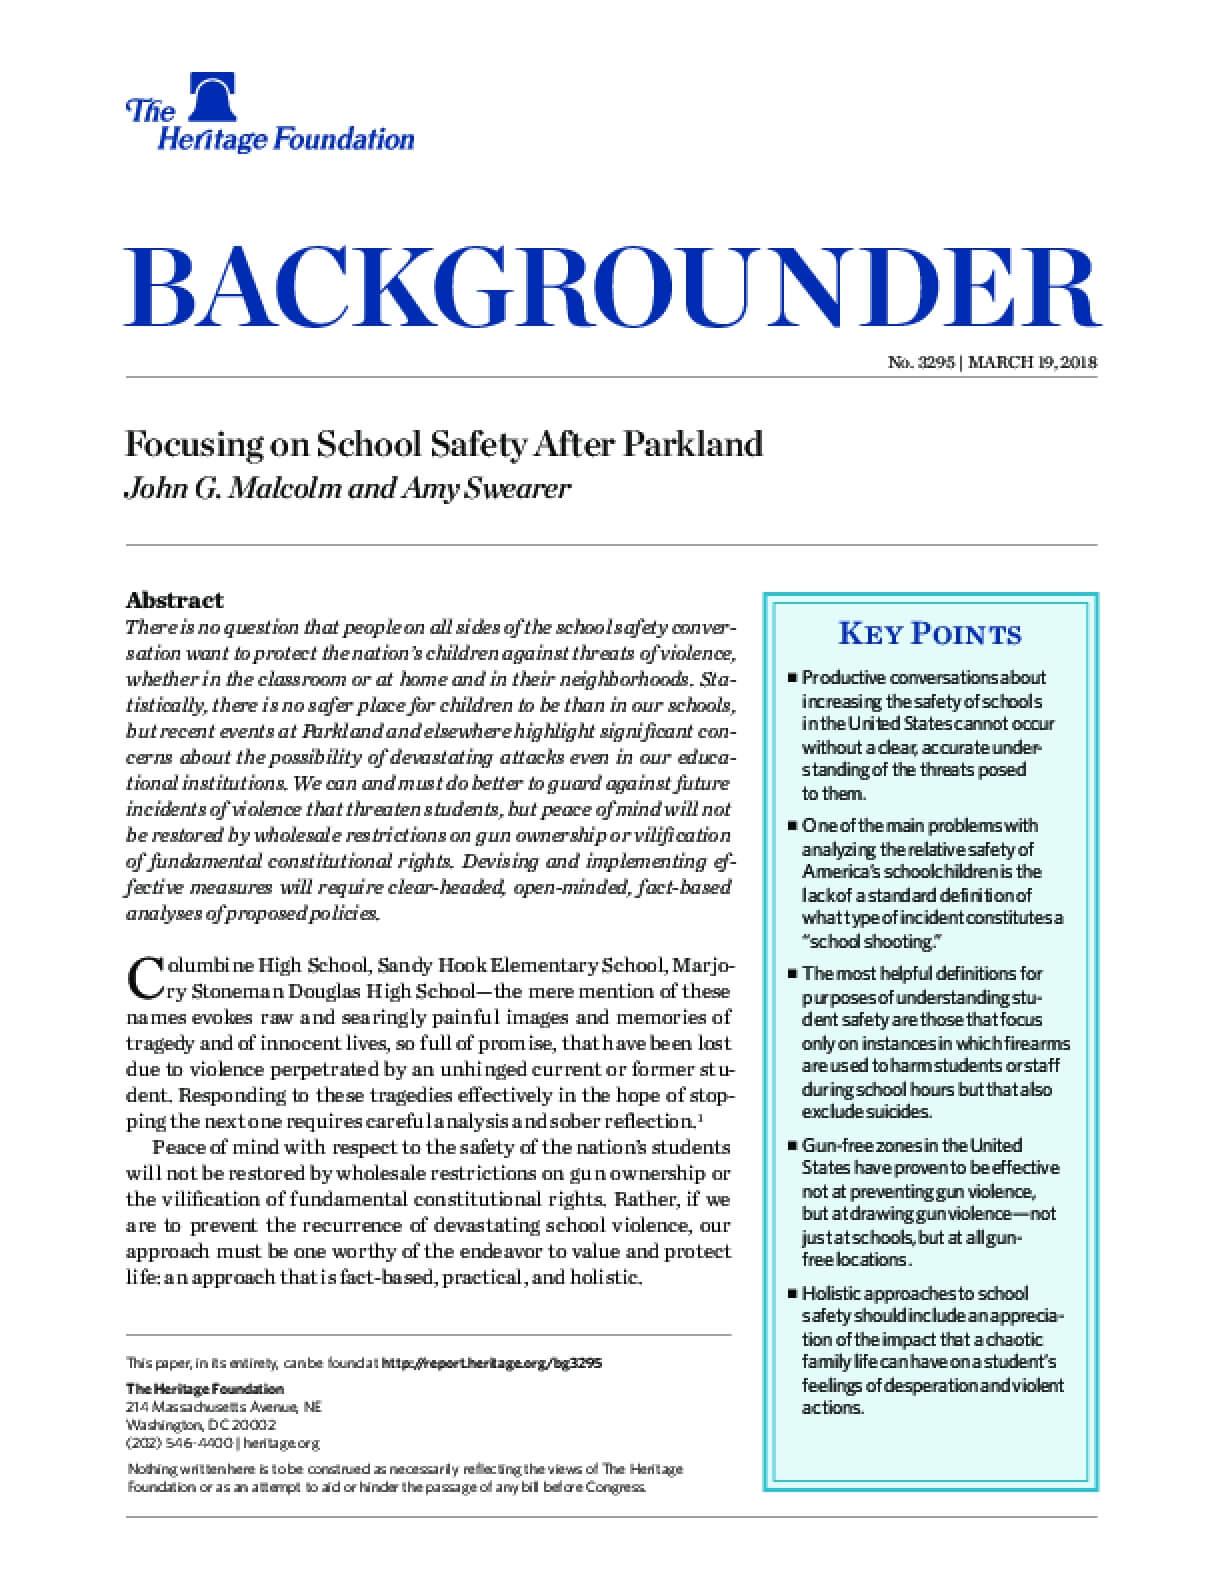 Focusing on School Safety After Parkland